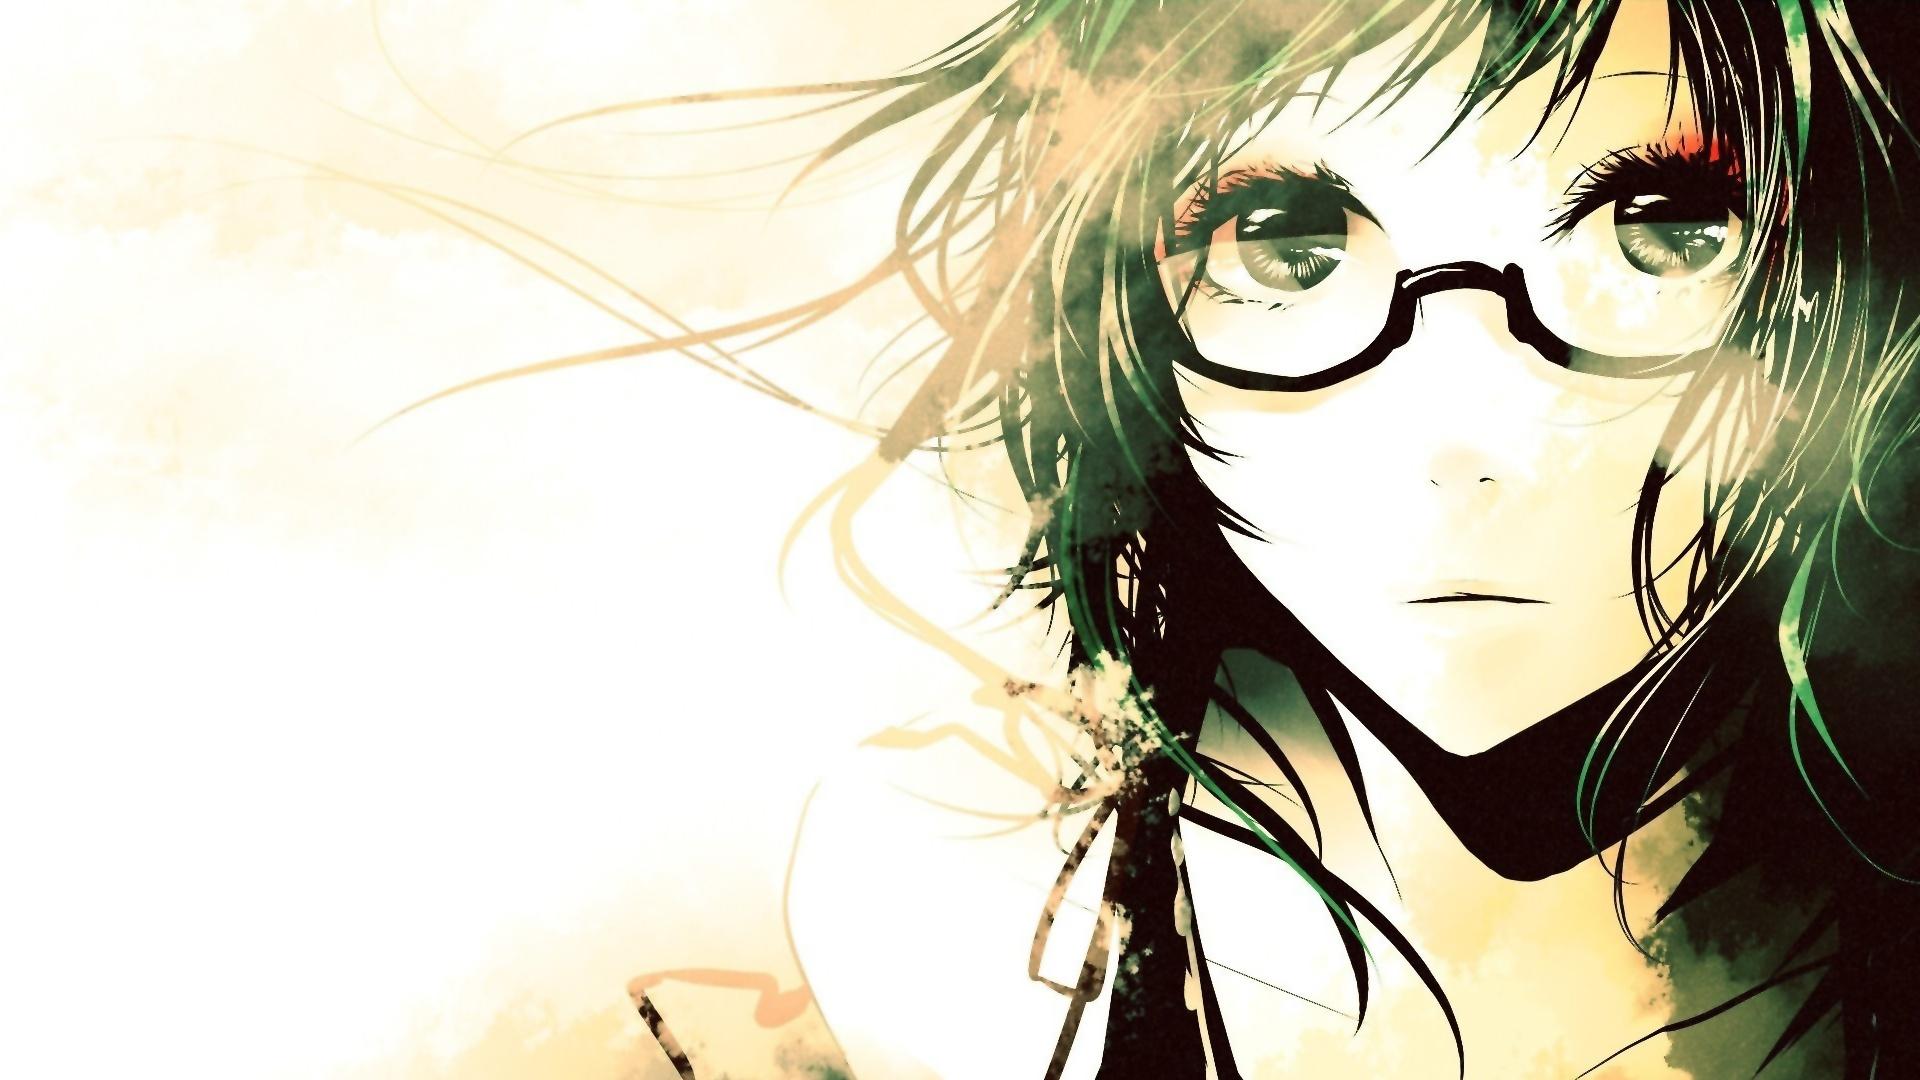 1080p Anime Wallpapers HD 1920x1080